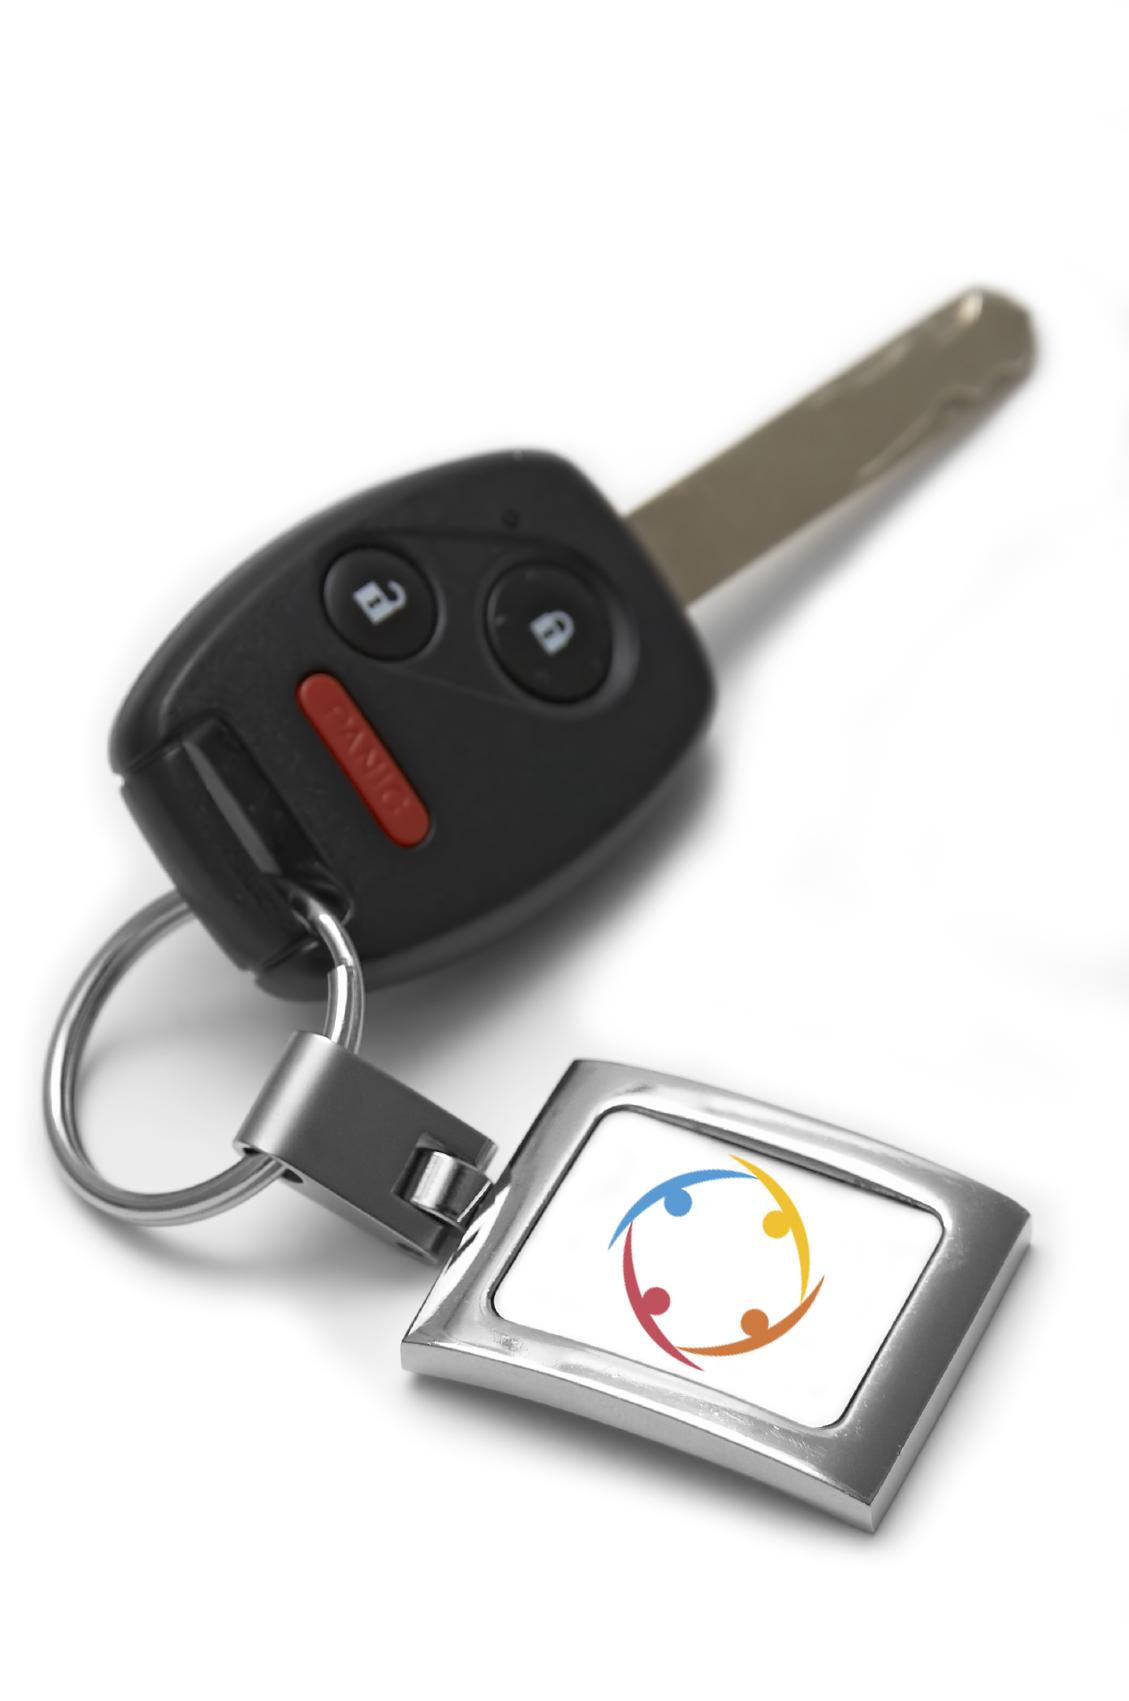 key.png